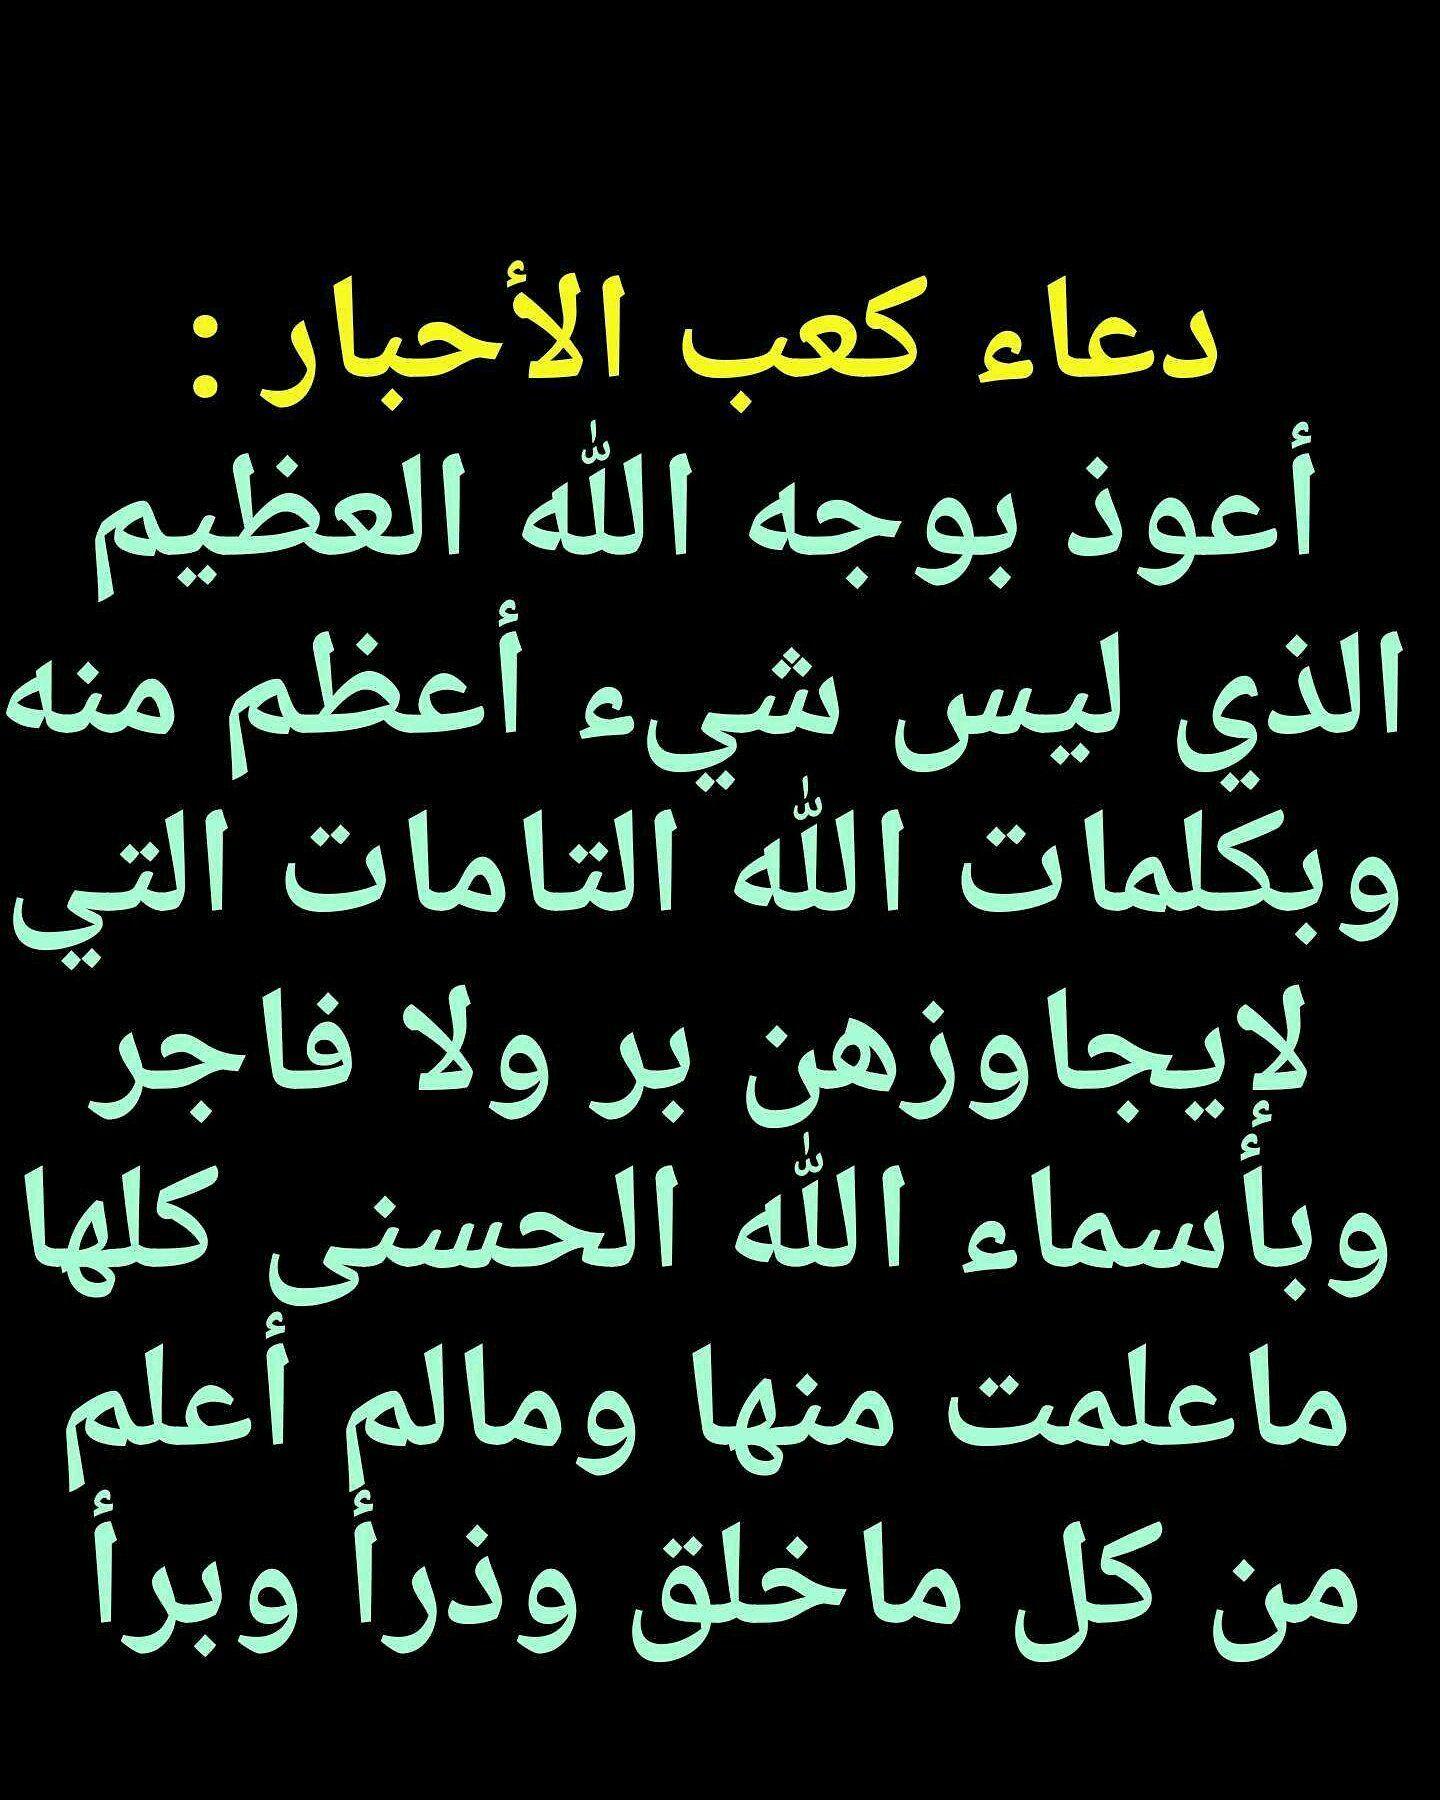 Pin By Khaled1000 On دعاء و ذكر Arabic Uji Calligraphy